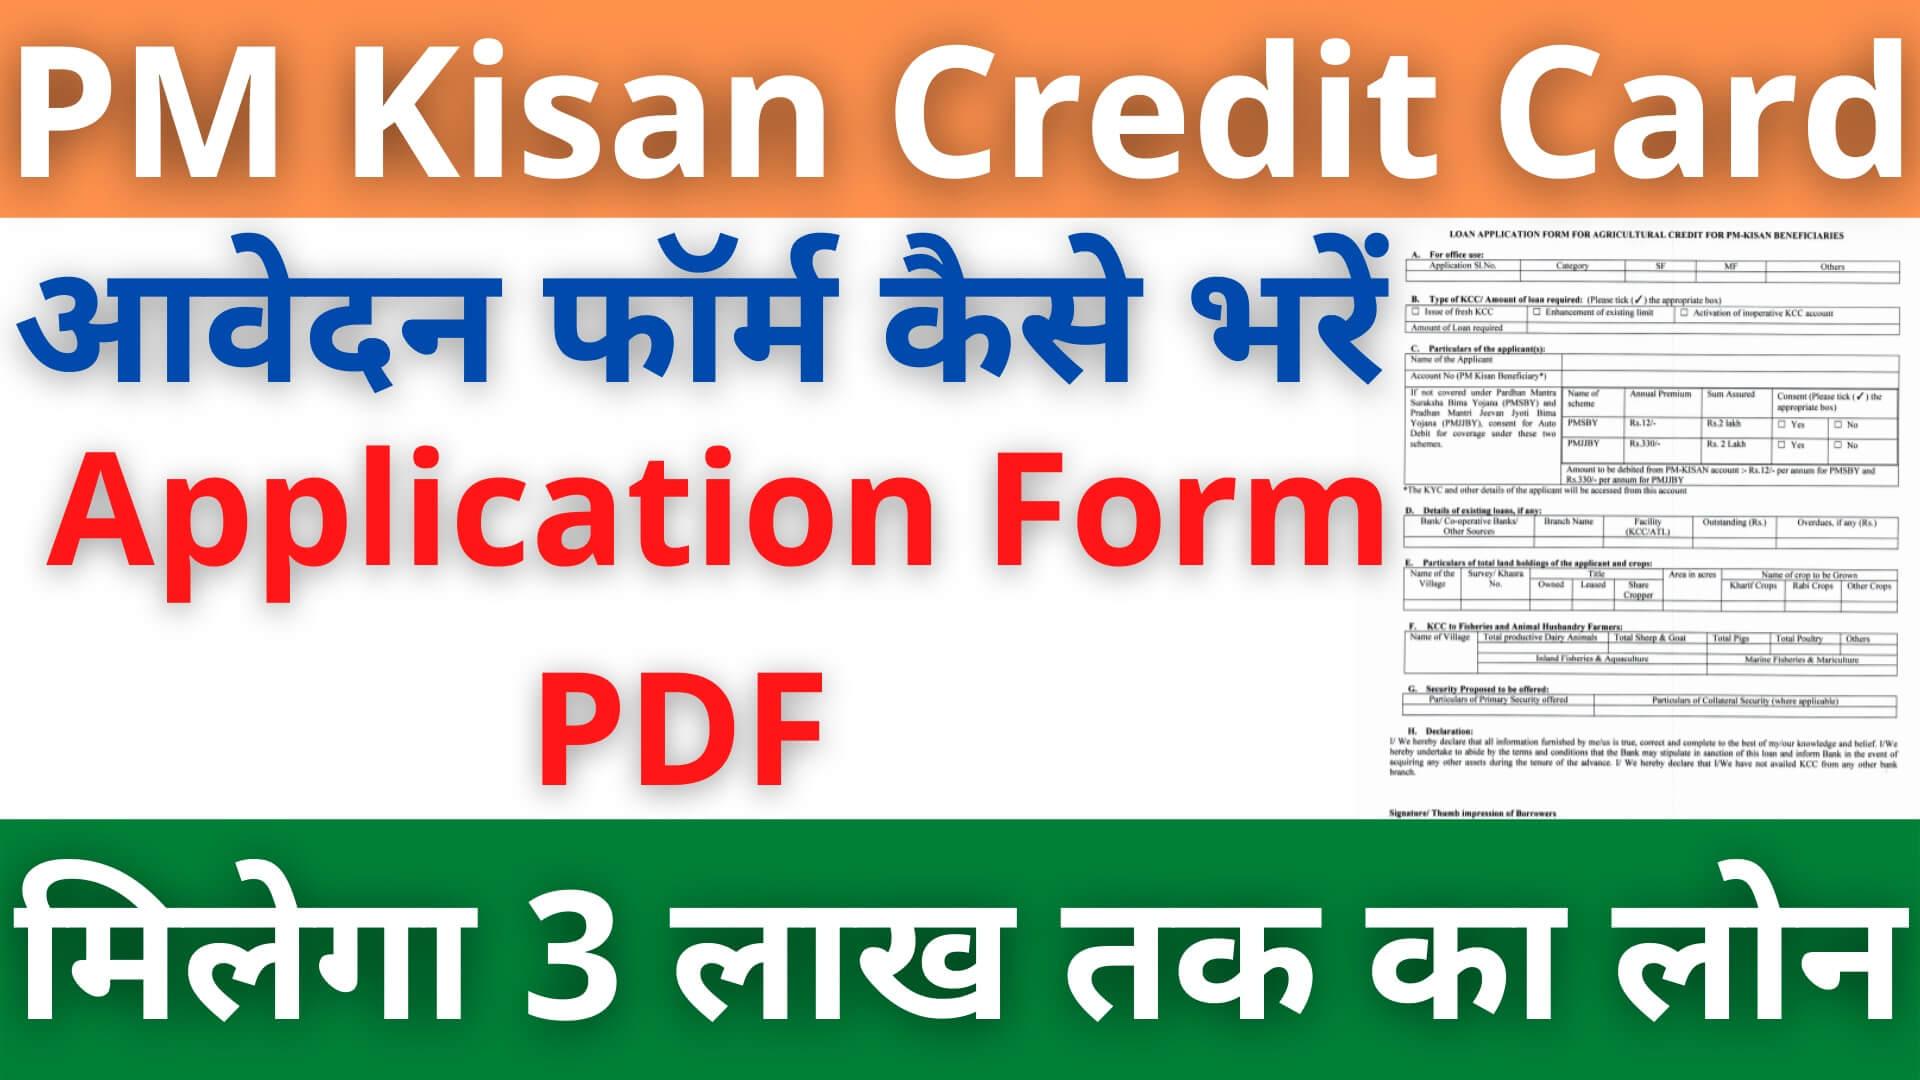 Kisan Credit Card Application Form PDF